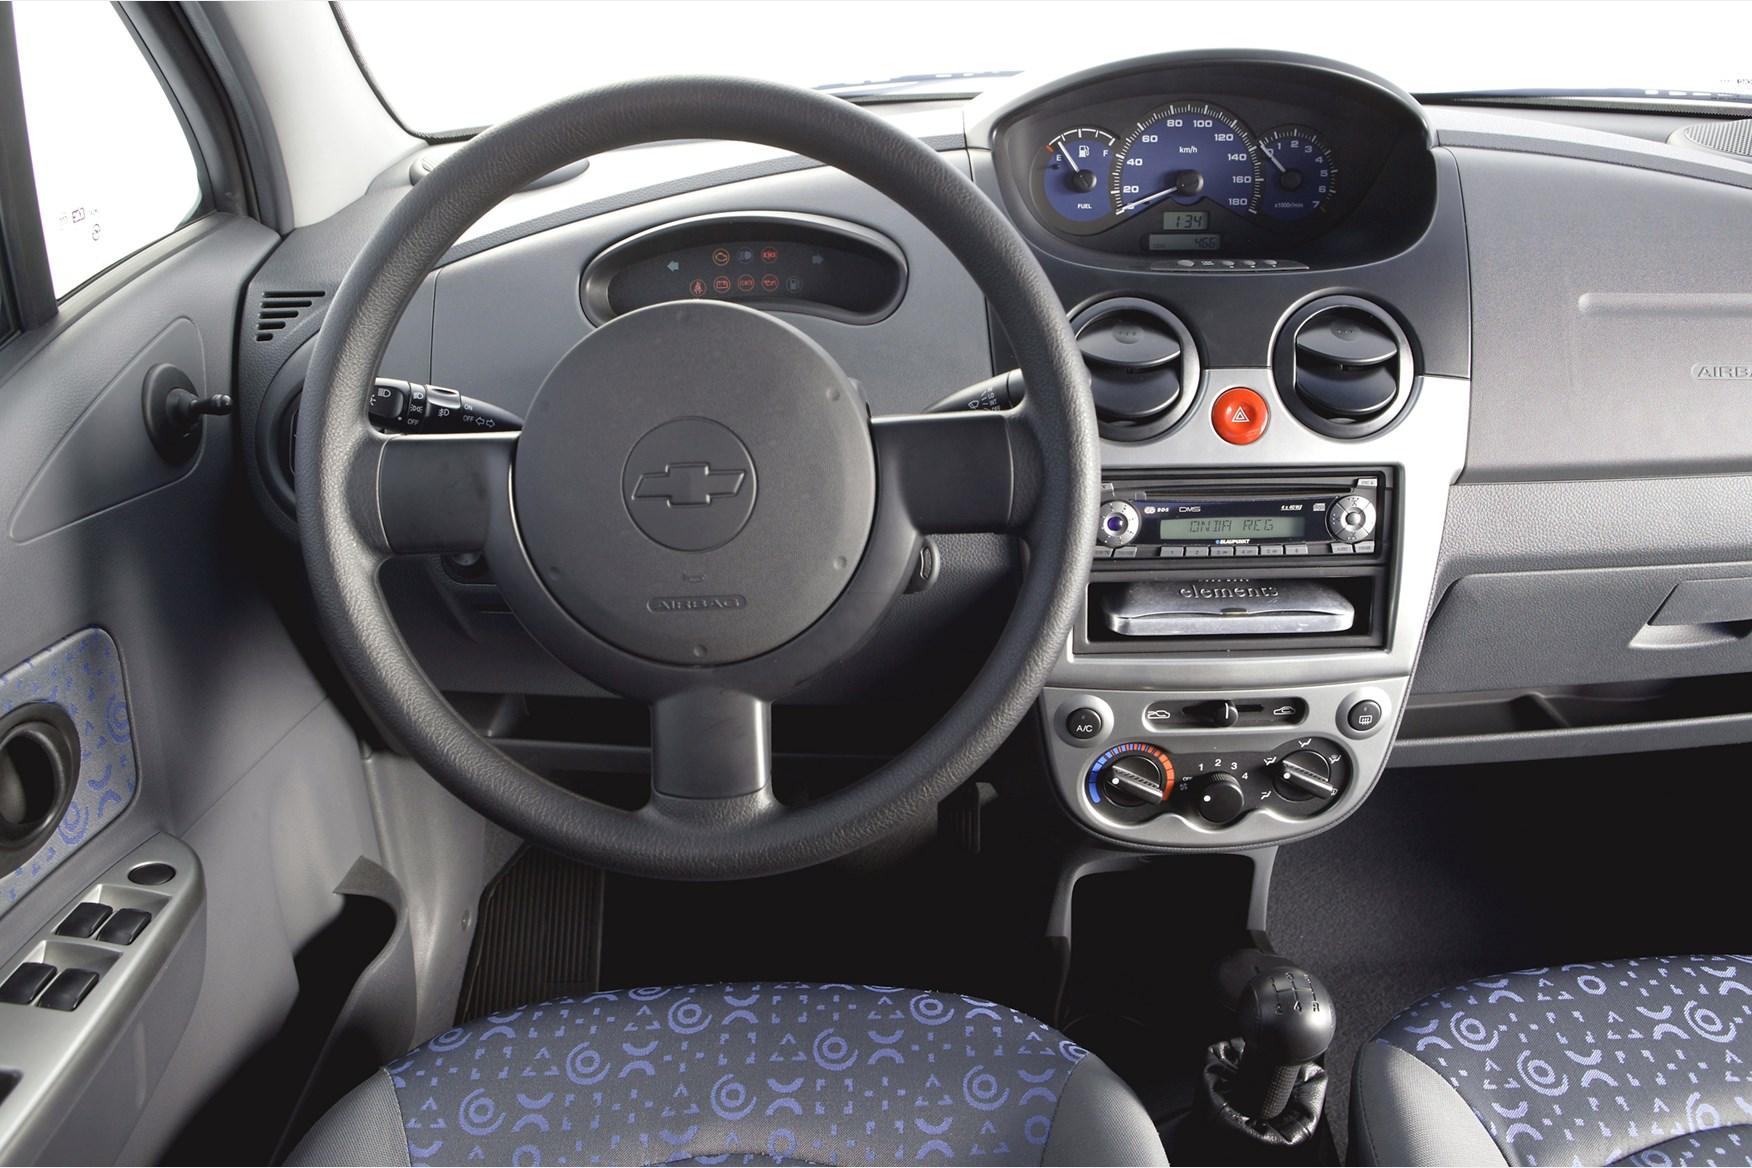 chevrolet matiz hatchback review  2005